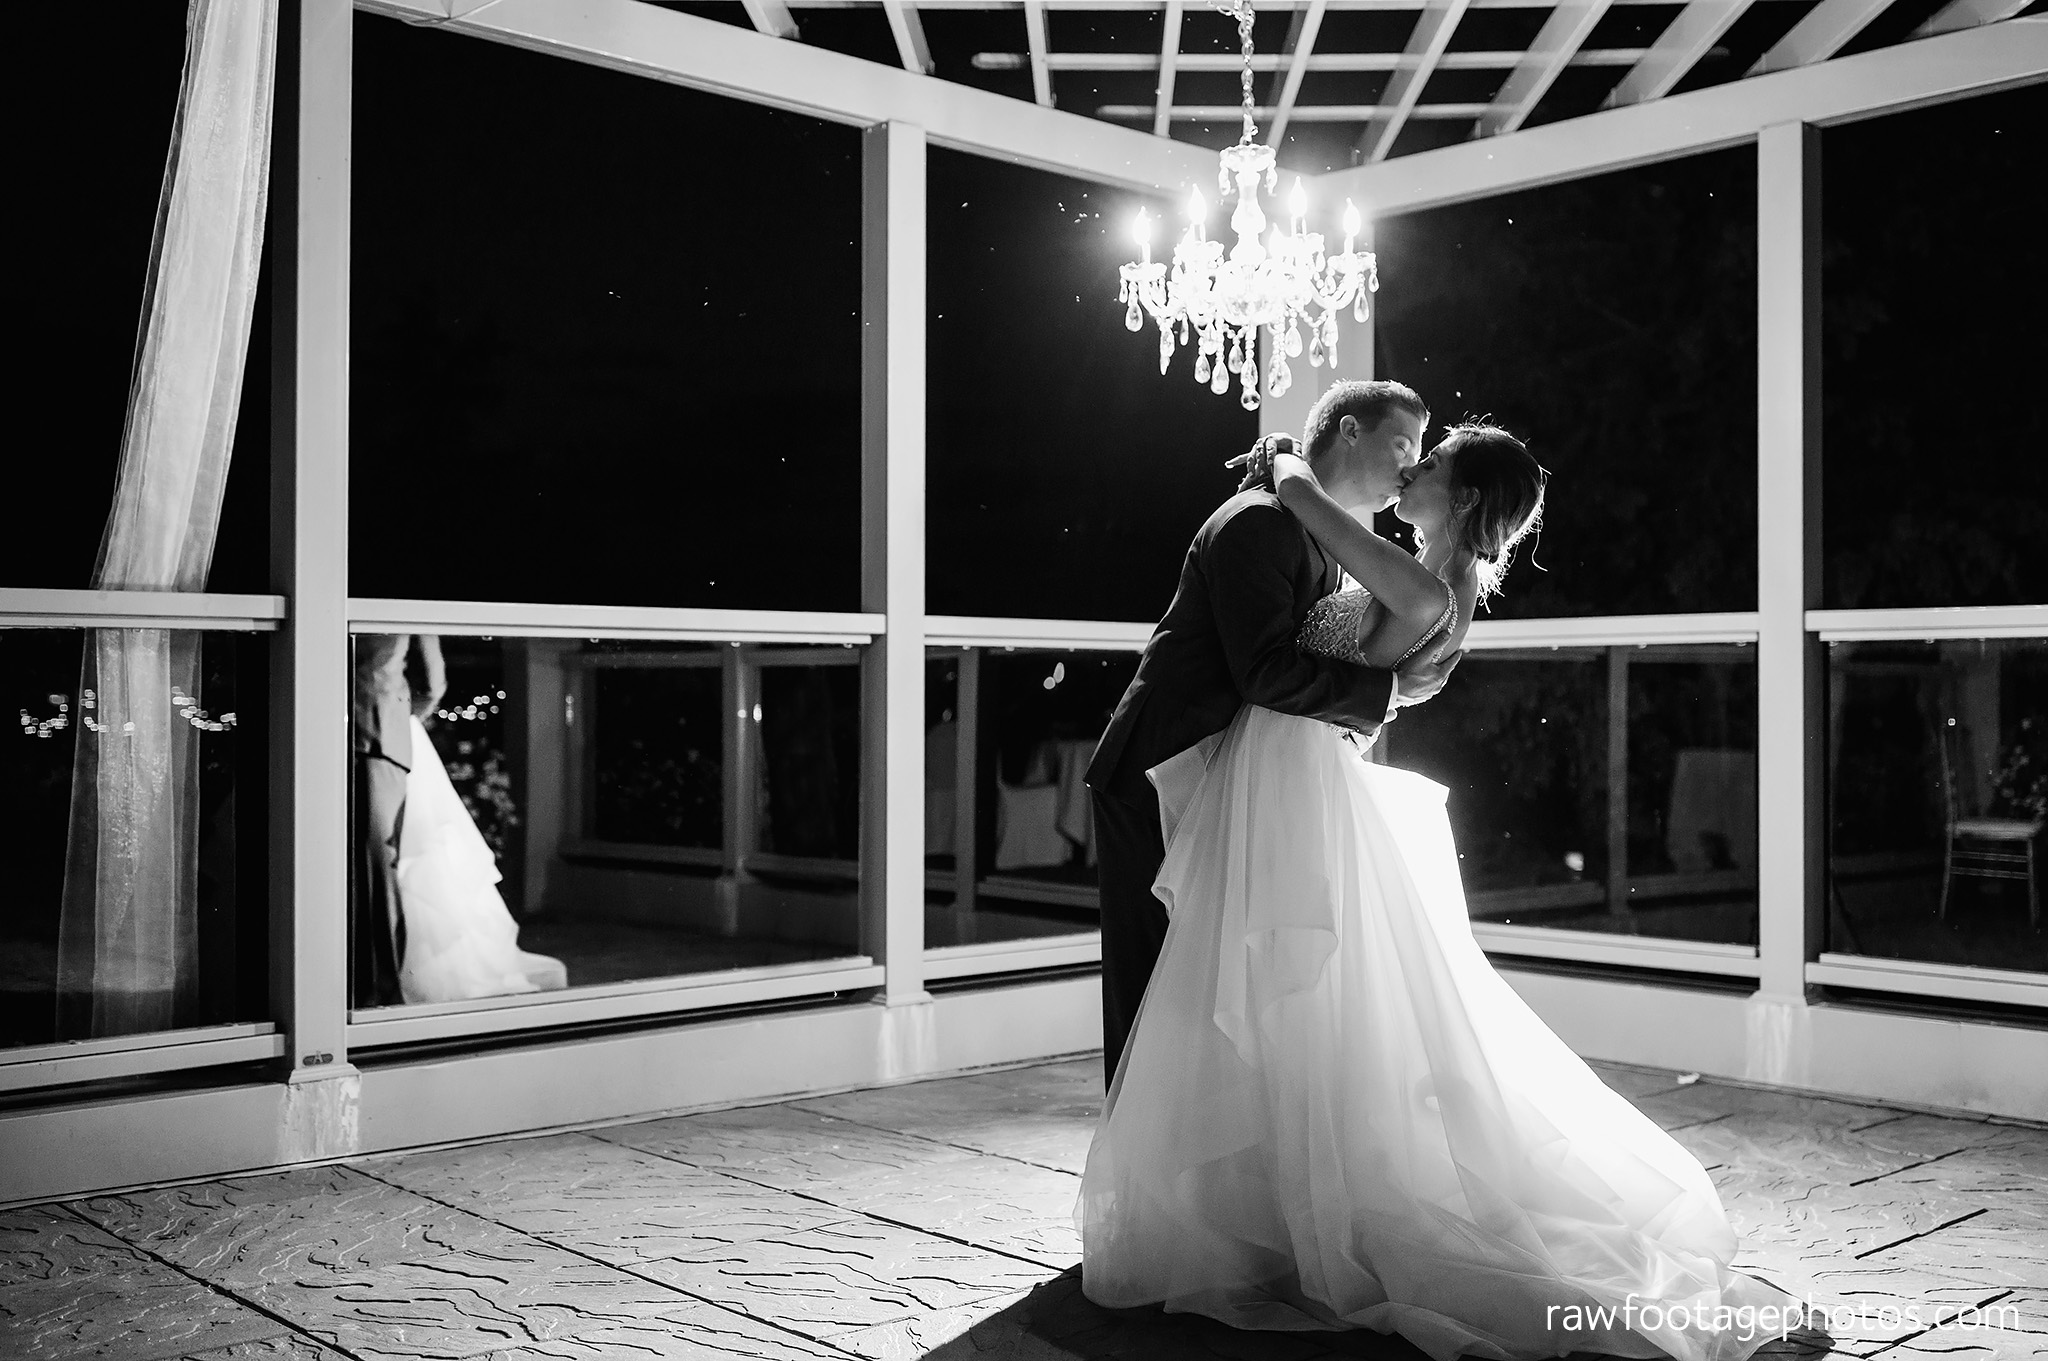 london_ontario_wedding_photographer-grand_bend_wedding_photographer-oakwood_resort_wedding-beach_wedding-sunset_wedding-raw_footage_photography074.jpg